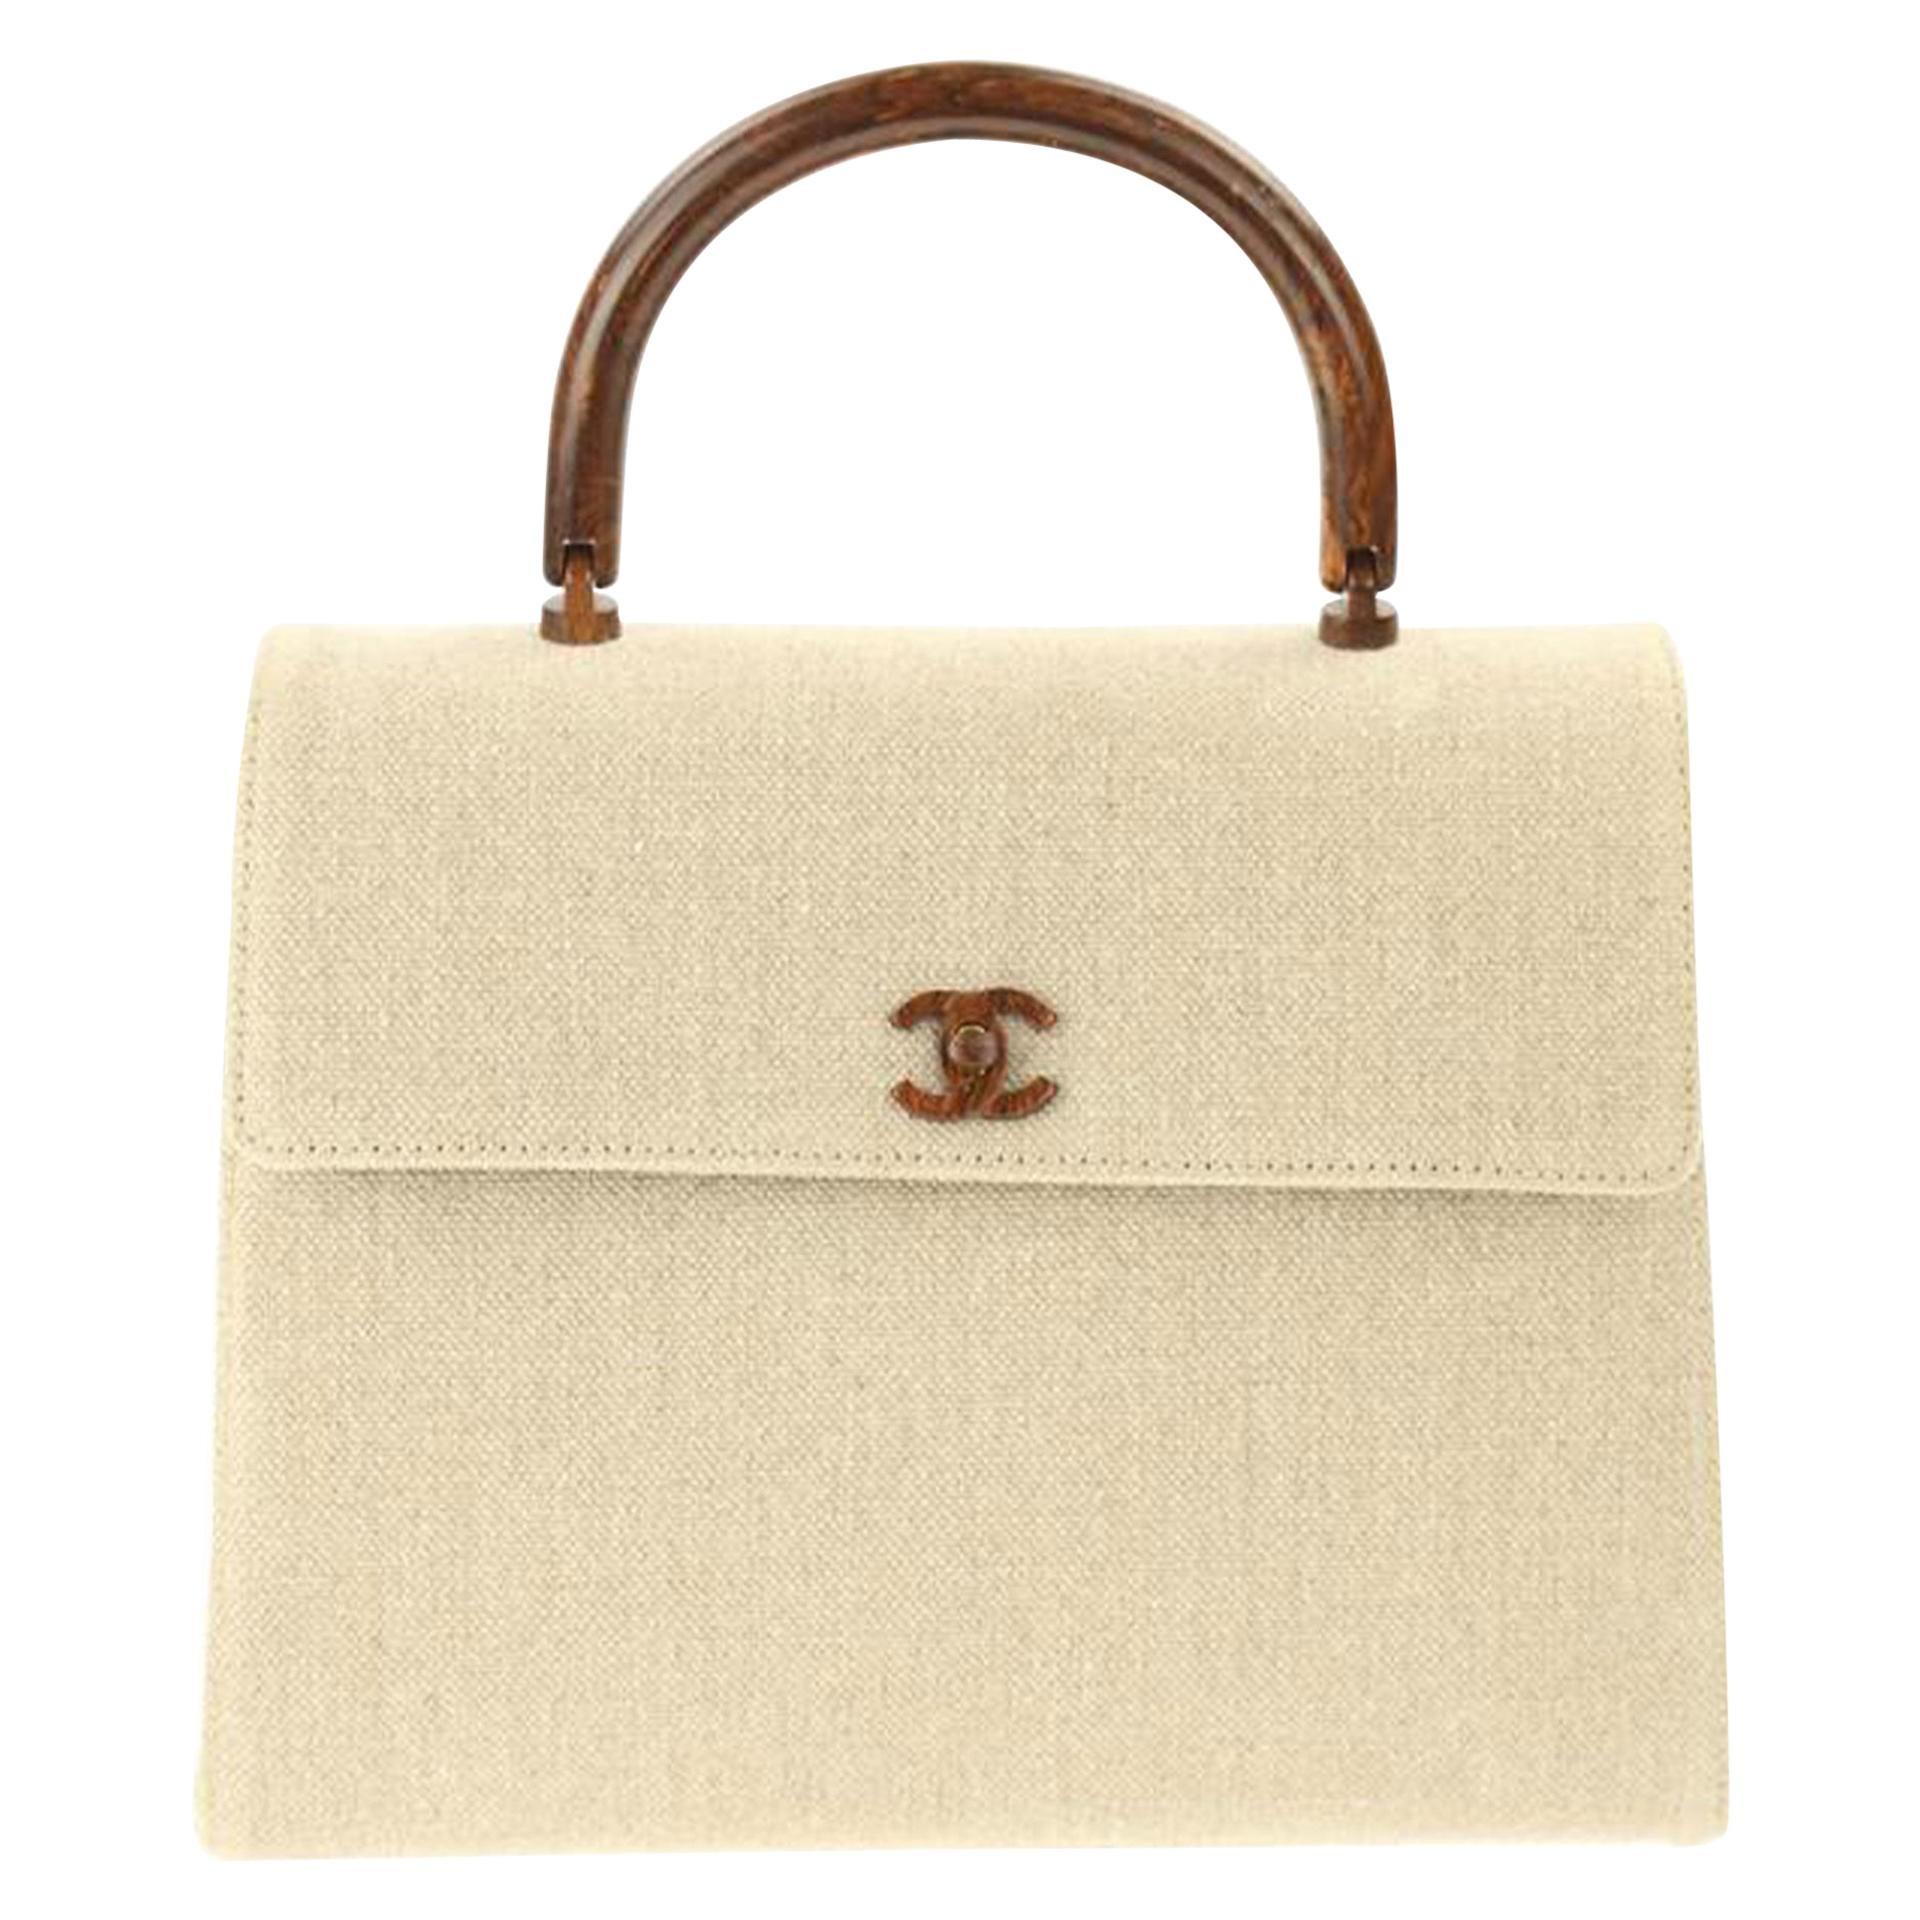 Chanel Flap Bag with Top Handle Wood Beige Canvas Satchel